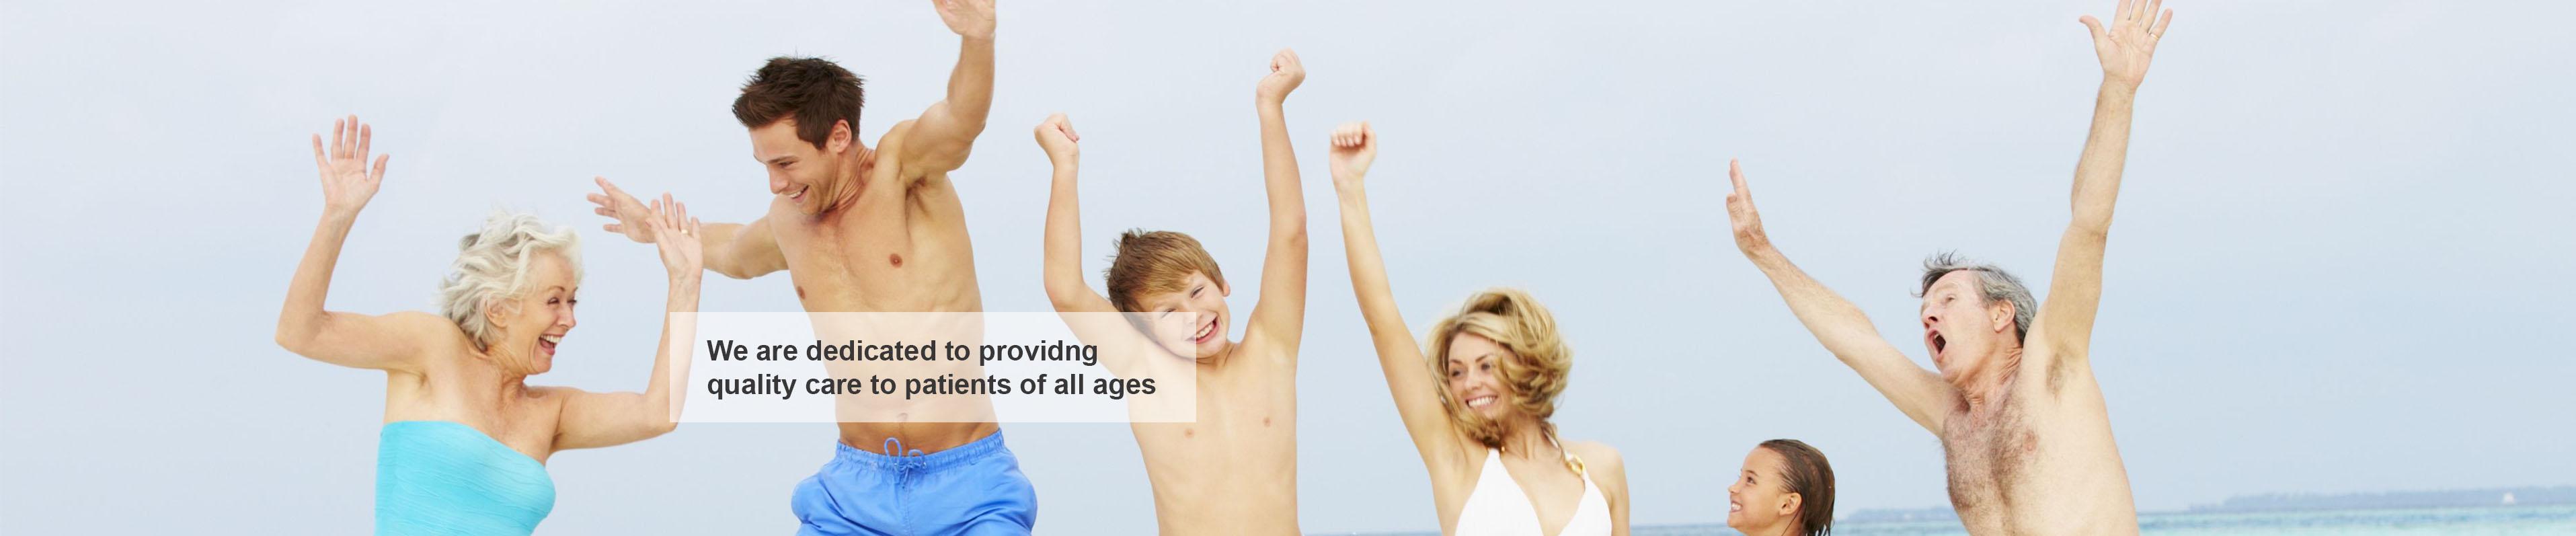 Family Jumping 2.jpg